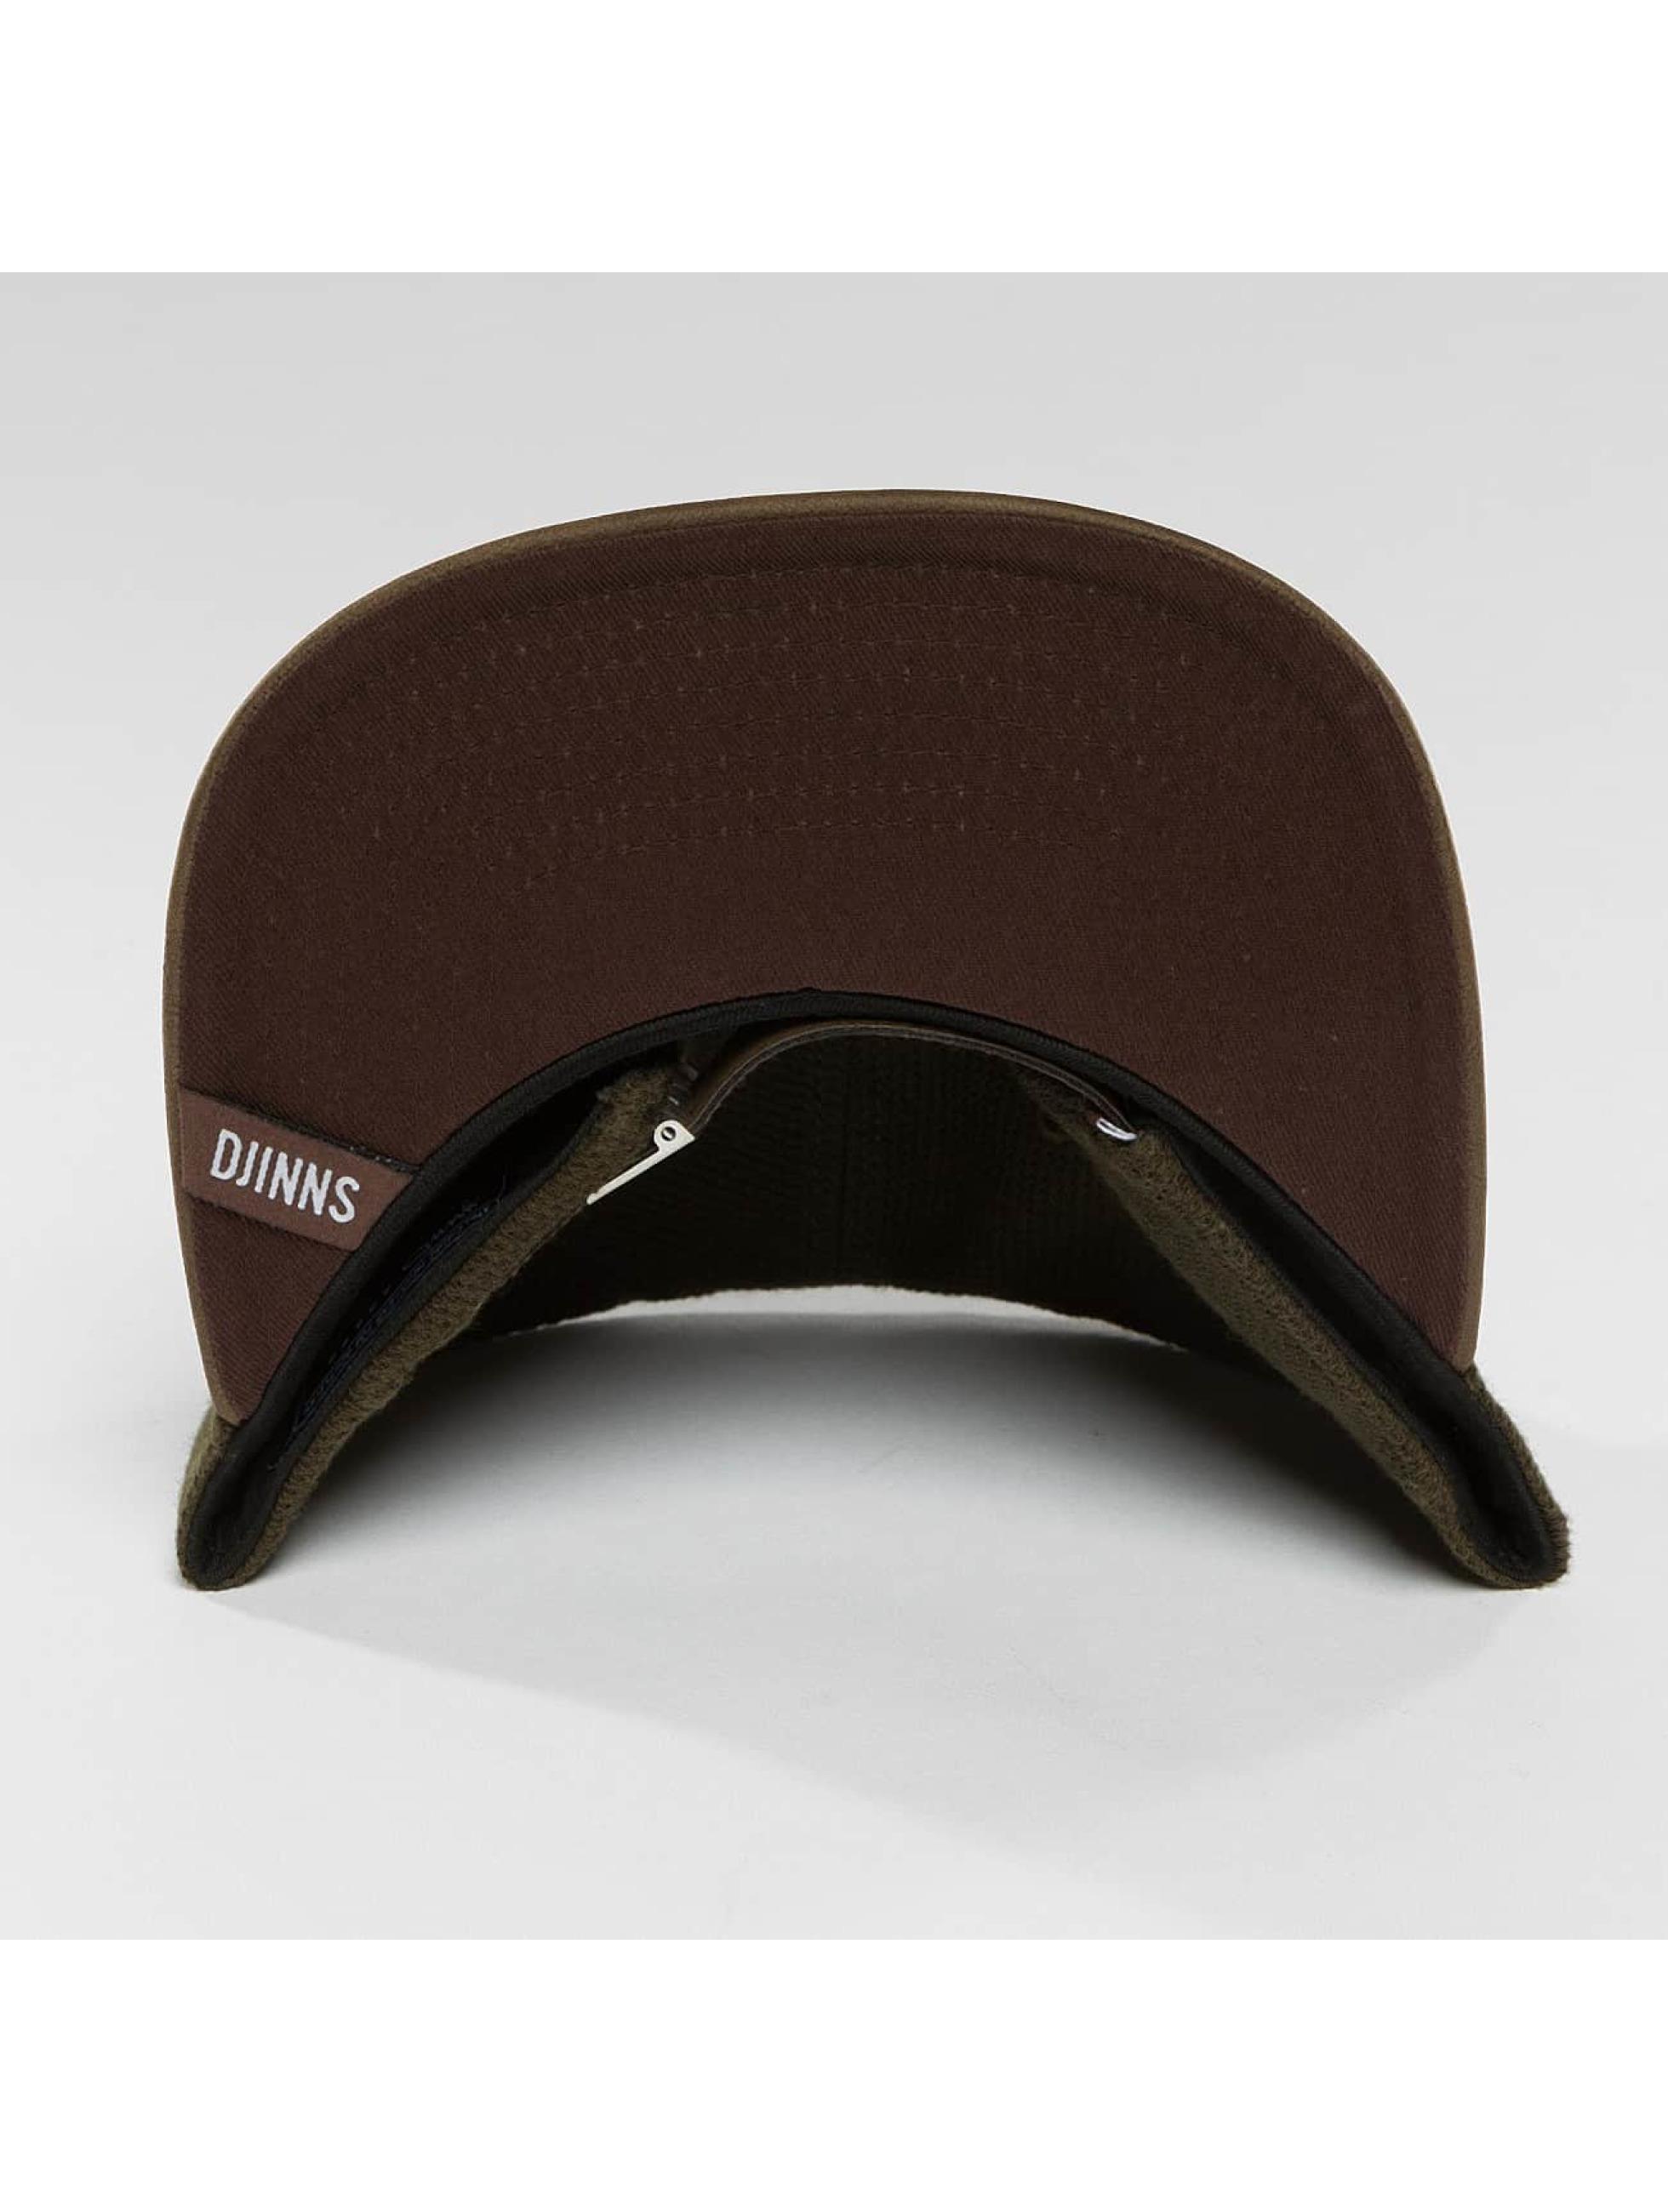 Djinns Casquette Snapback & Strapback 6 Panel Piki Leather brun